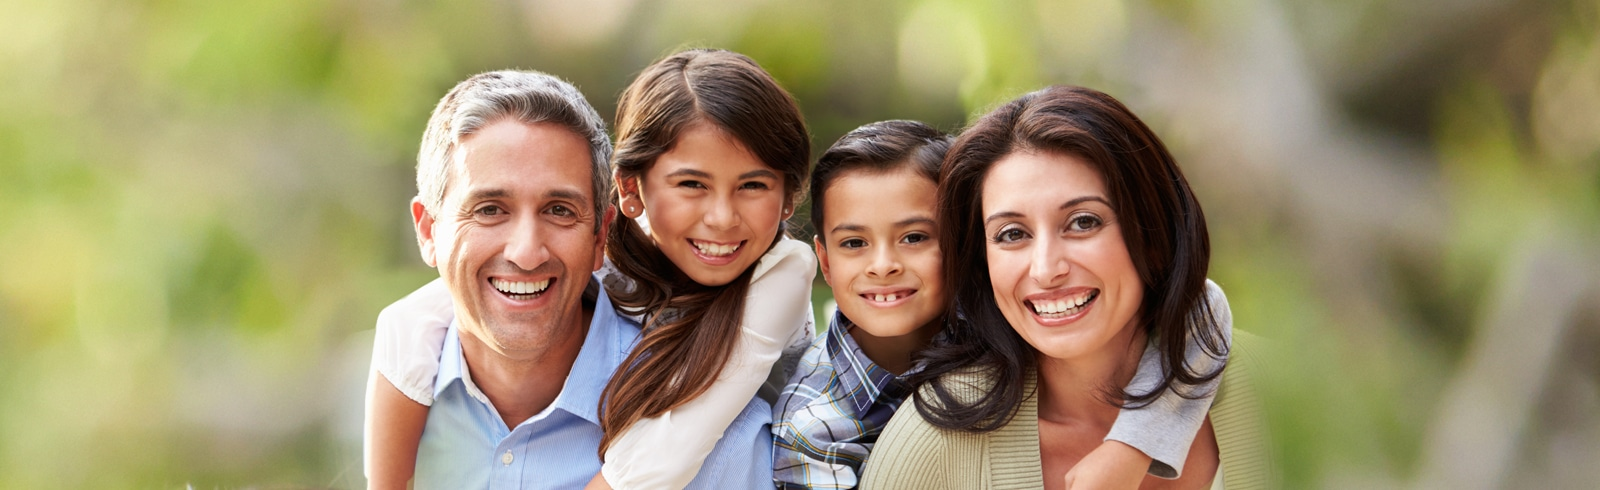 Family Health & Self Care